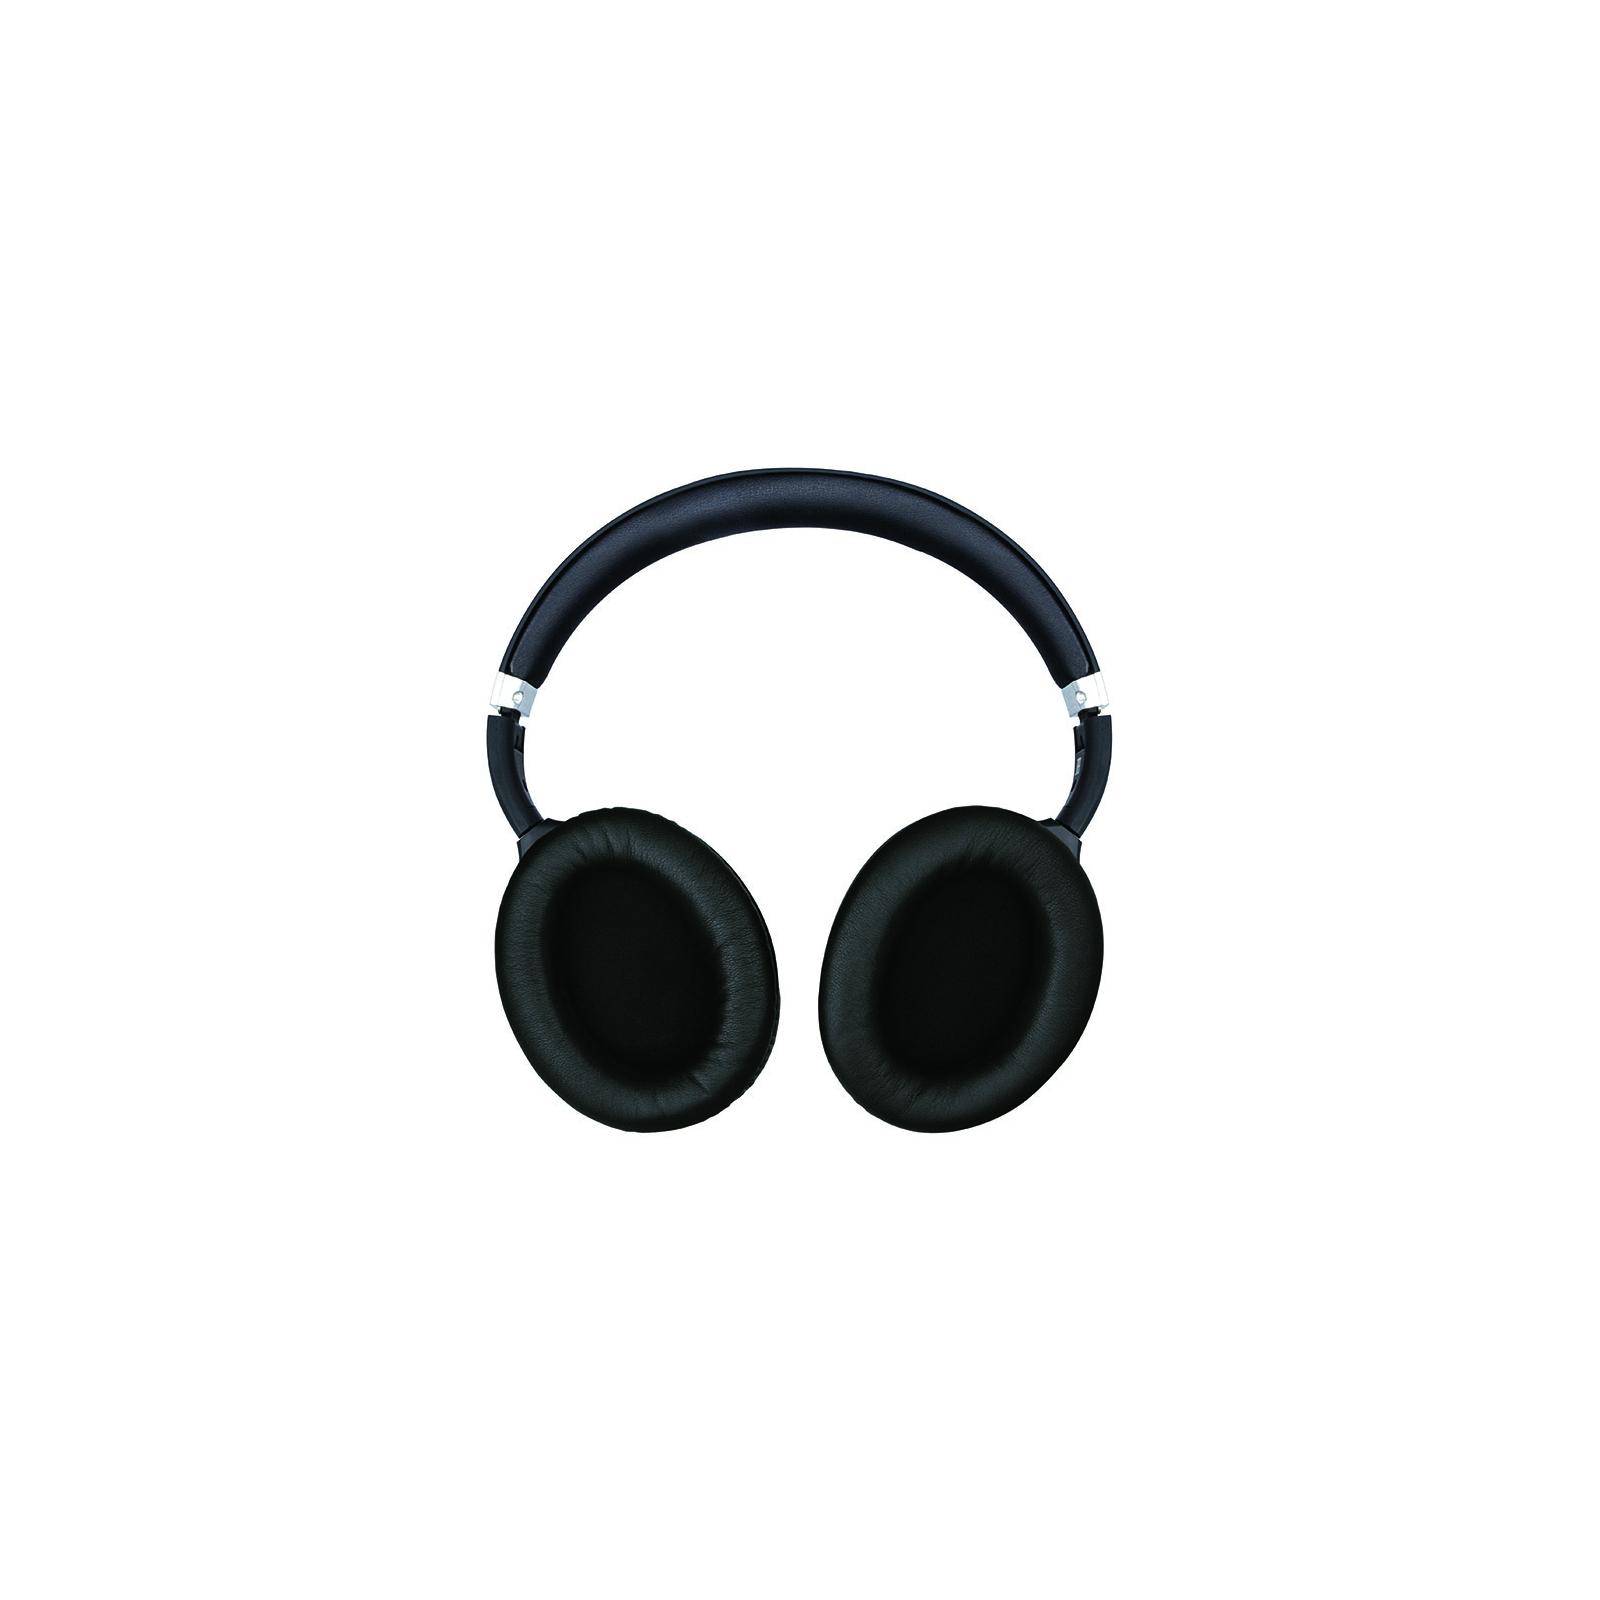 Наушники Sven AP-B900MV Black Bluetooth (AP-B900MV black) изображение 4